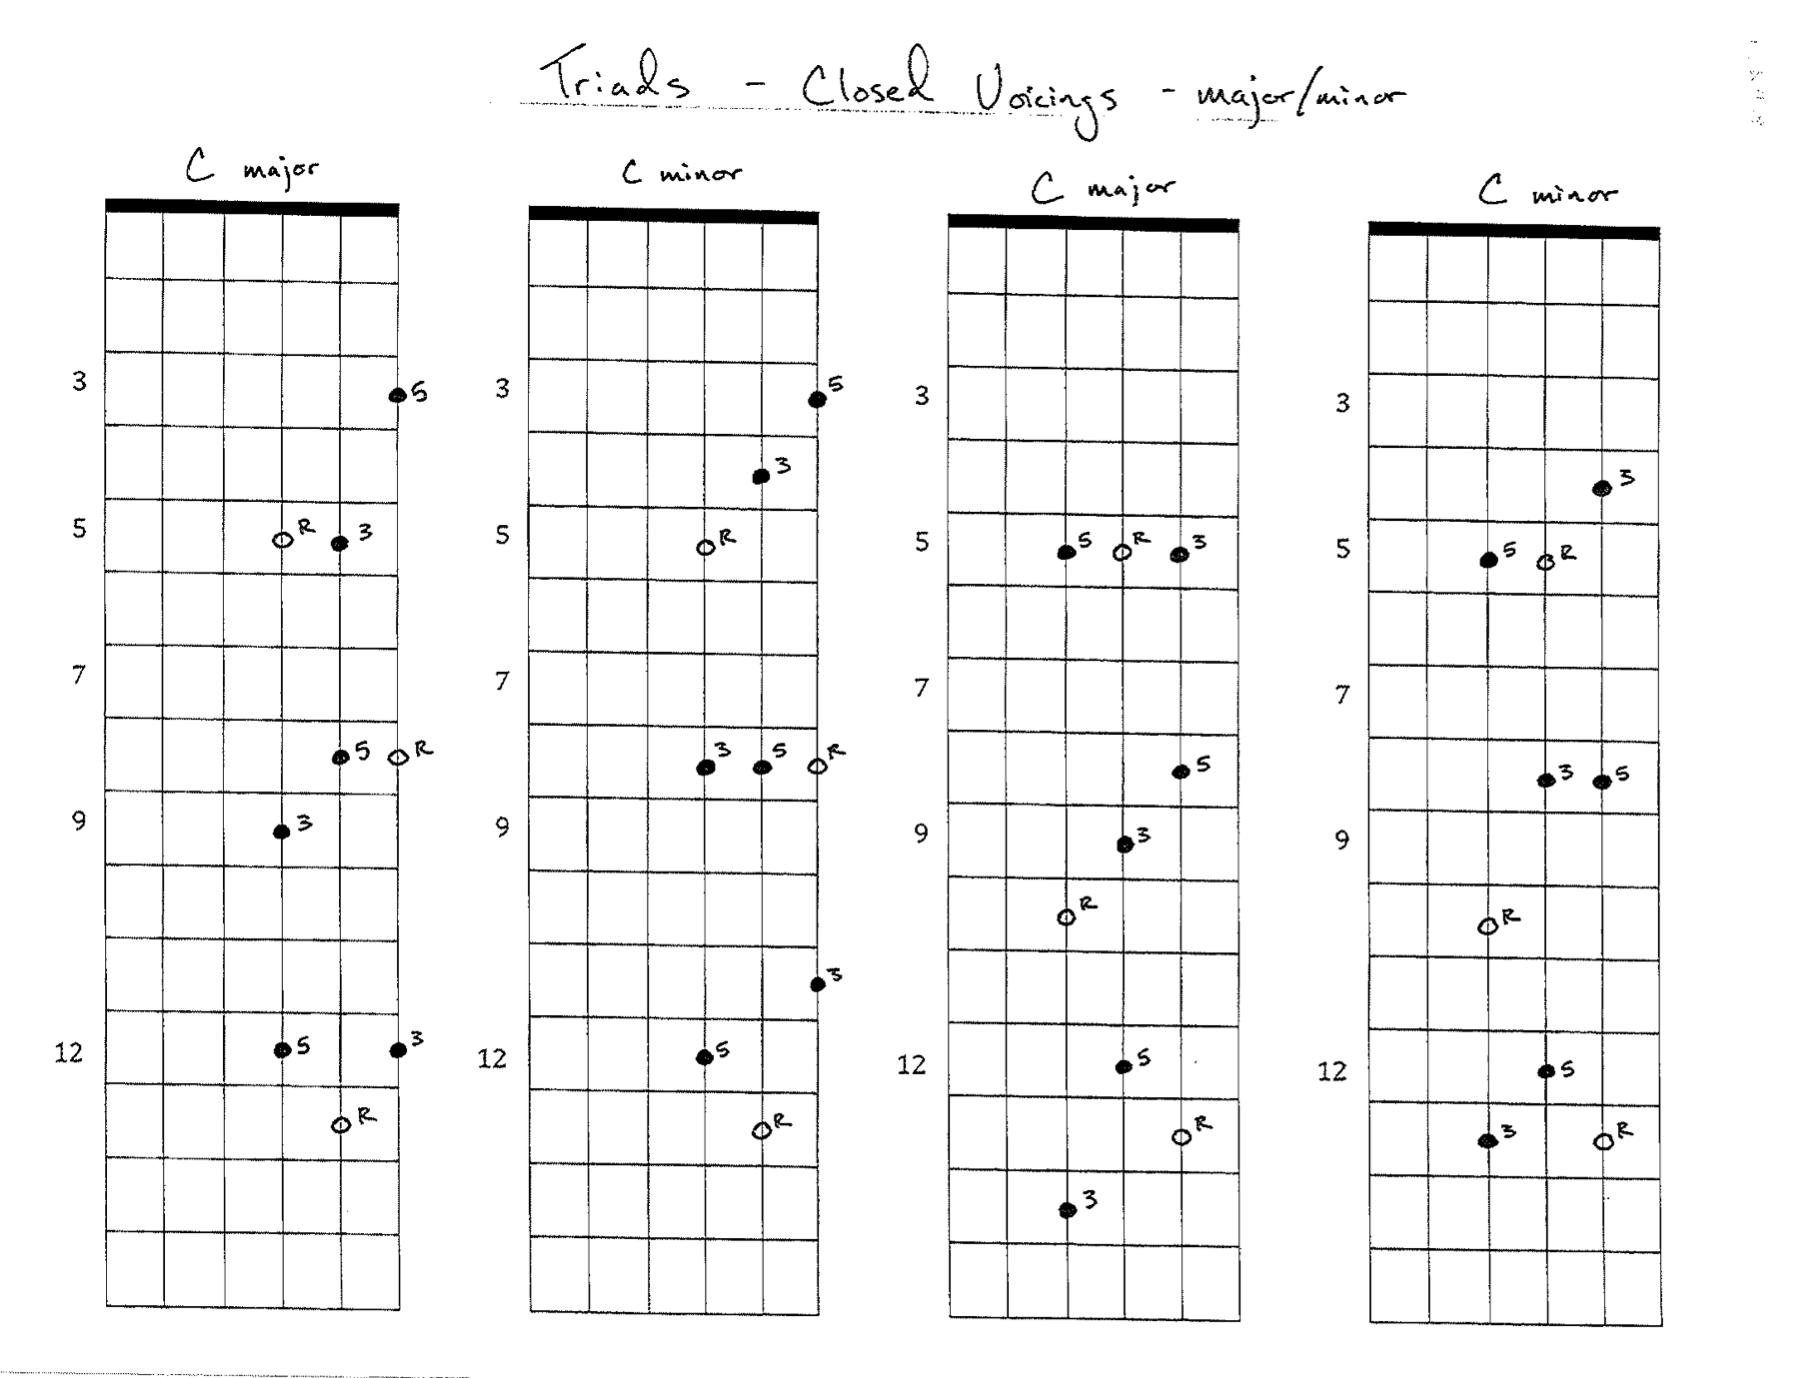 Orlando guitarist church musician - Triads full - maj:min